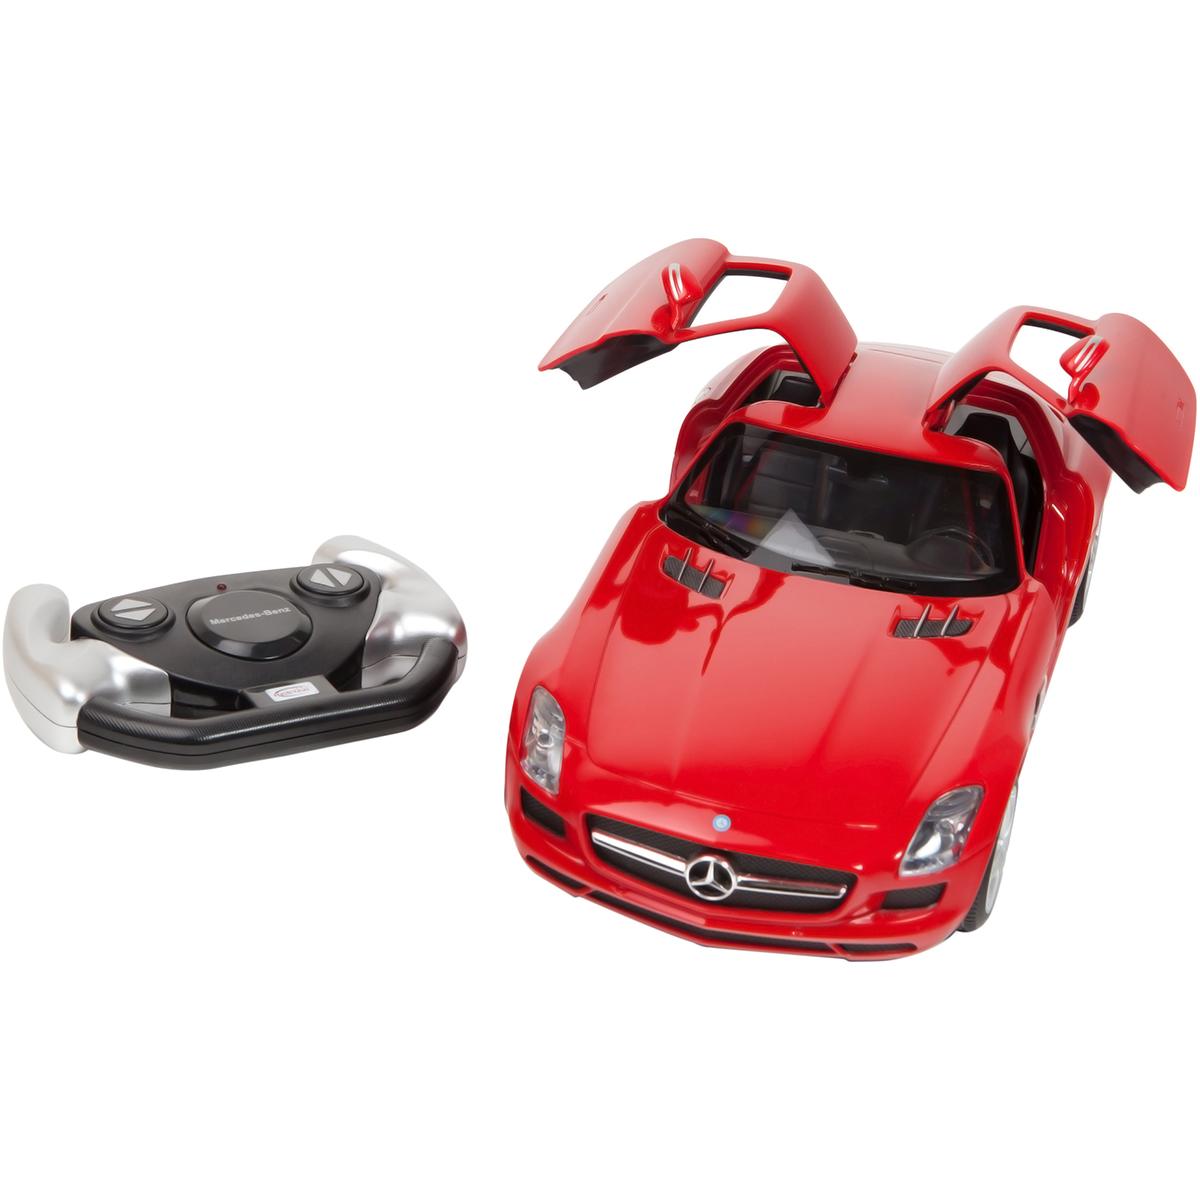 Masina cu telecomanda Rastar Mercedes Benz SLS AMG 1:14, Rosu